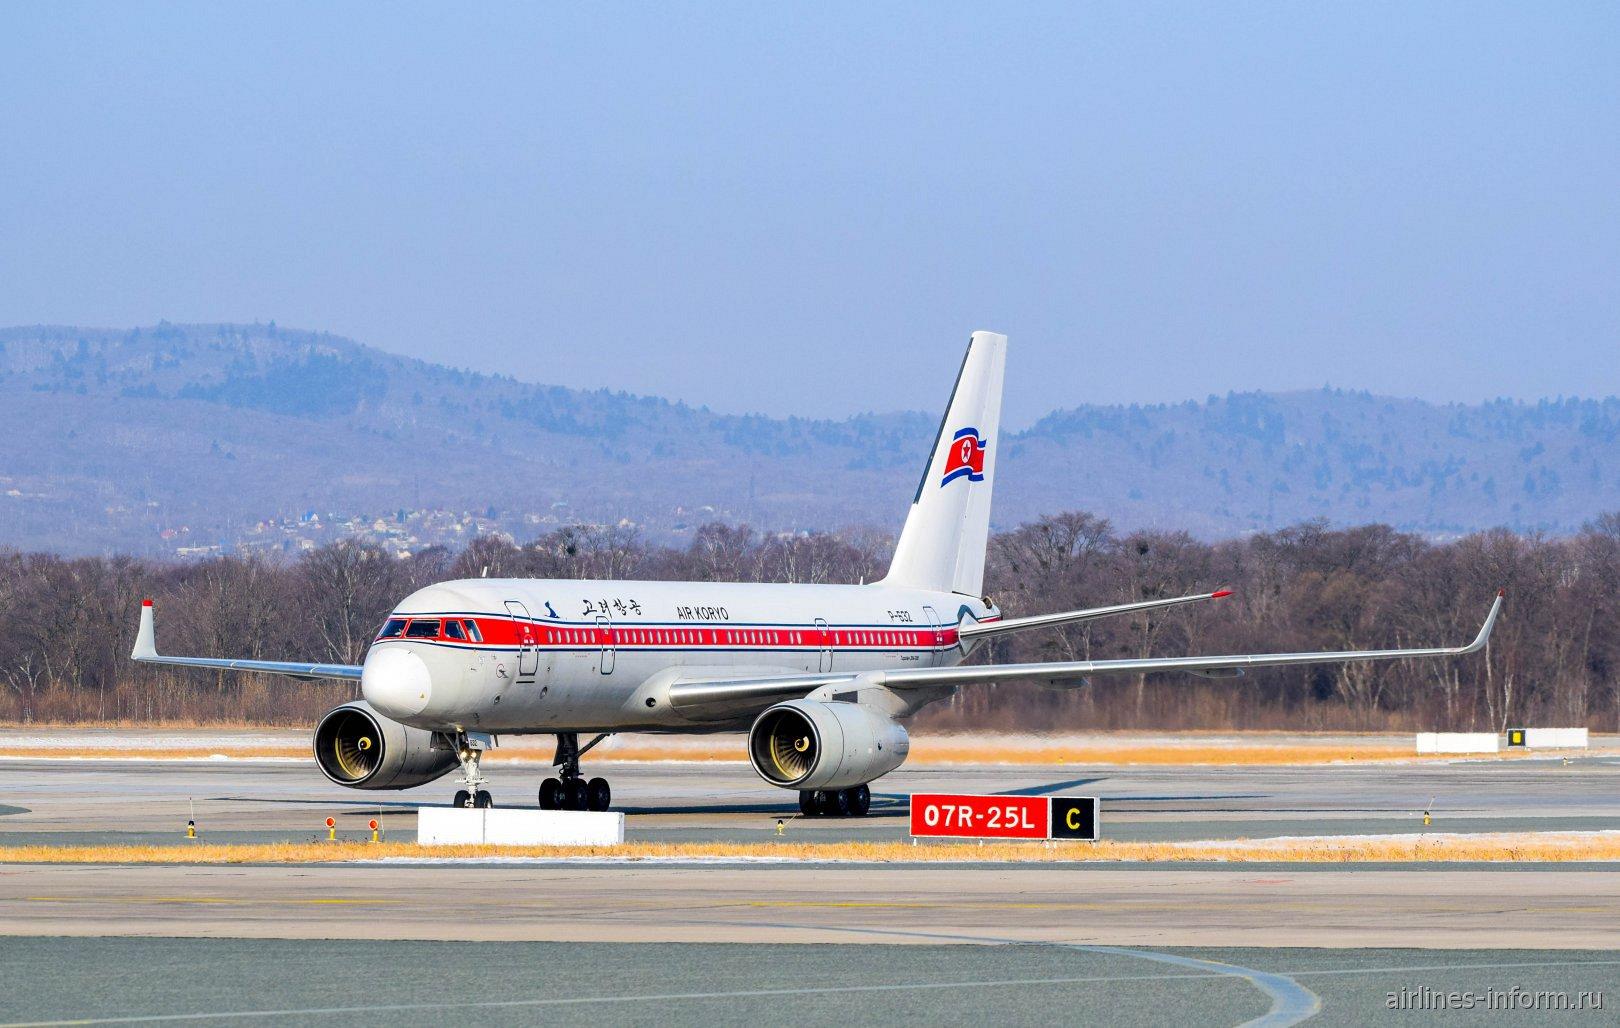 Самолет Ту-204-300 авиакомпании Air Koryo в аэропорту Владивостока